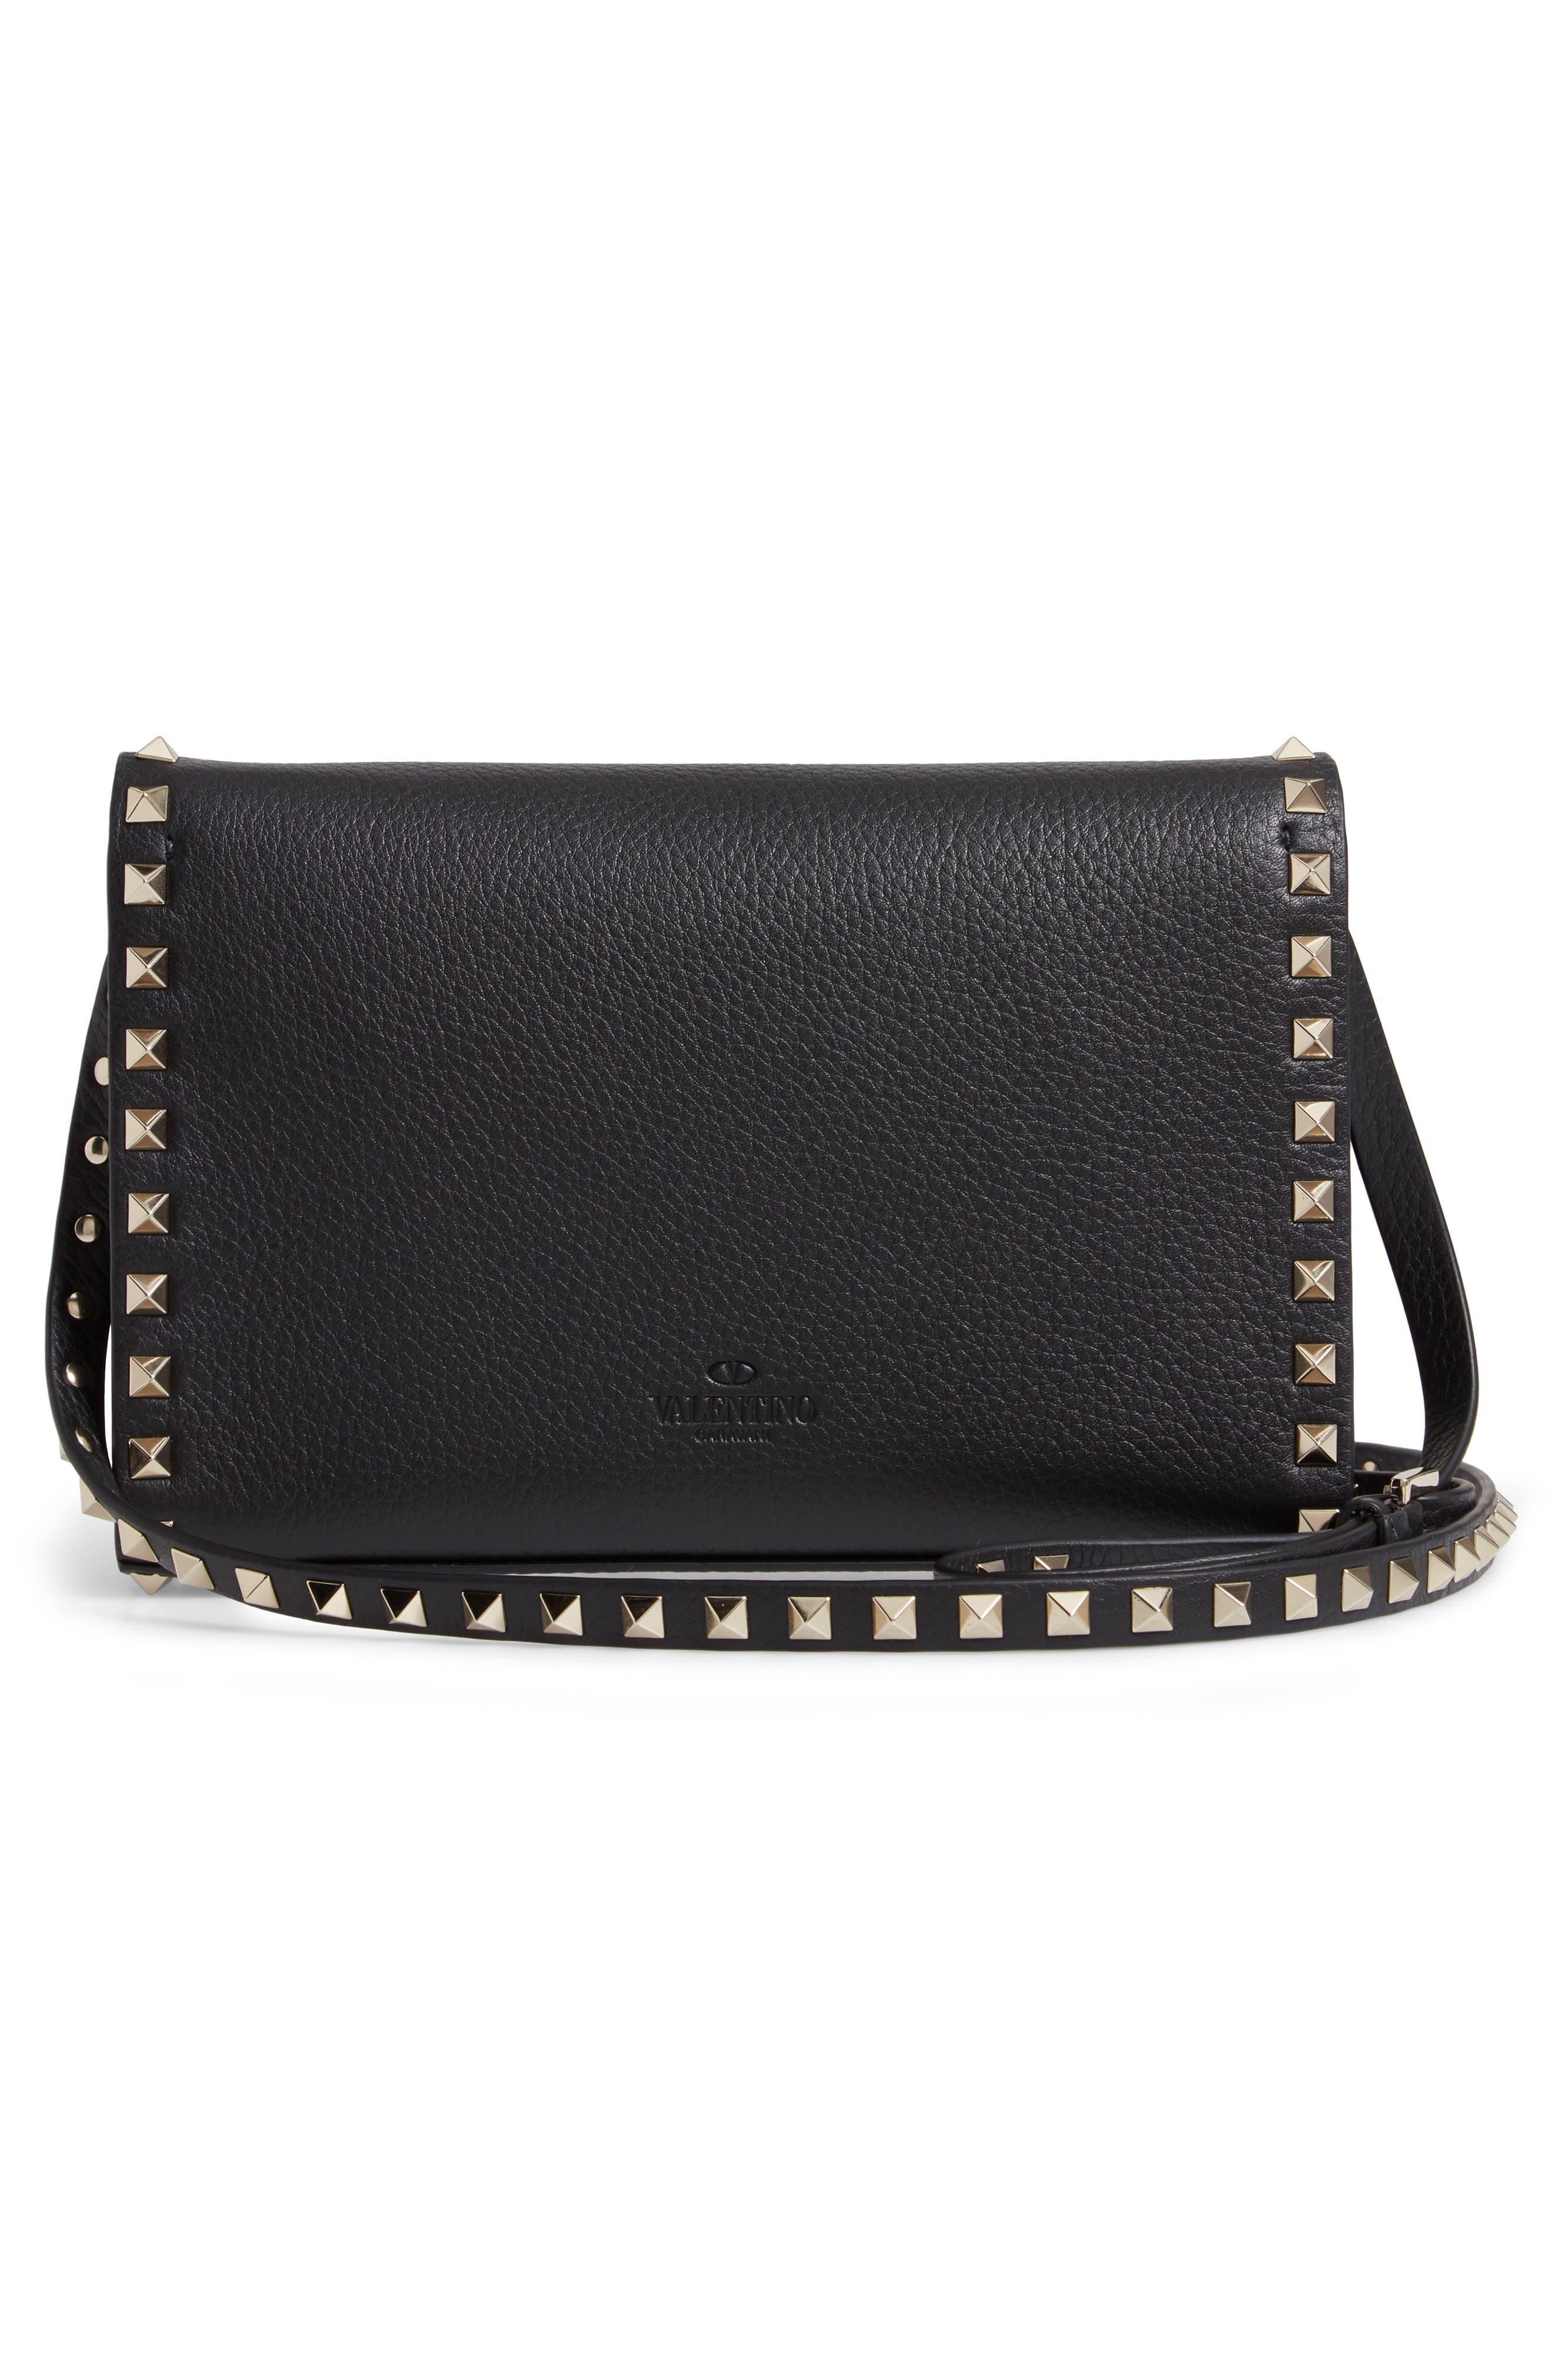 Medium Rockstud Leather Crossbody Bag,                             Alternate thumbnail 3, color,                             BLACK